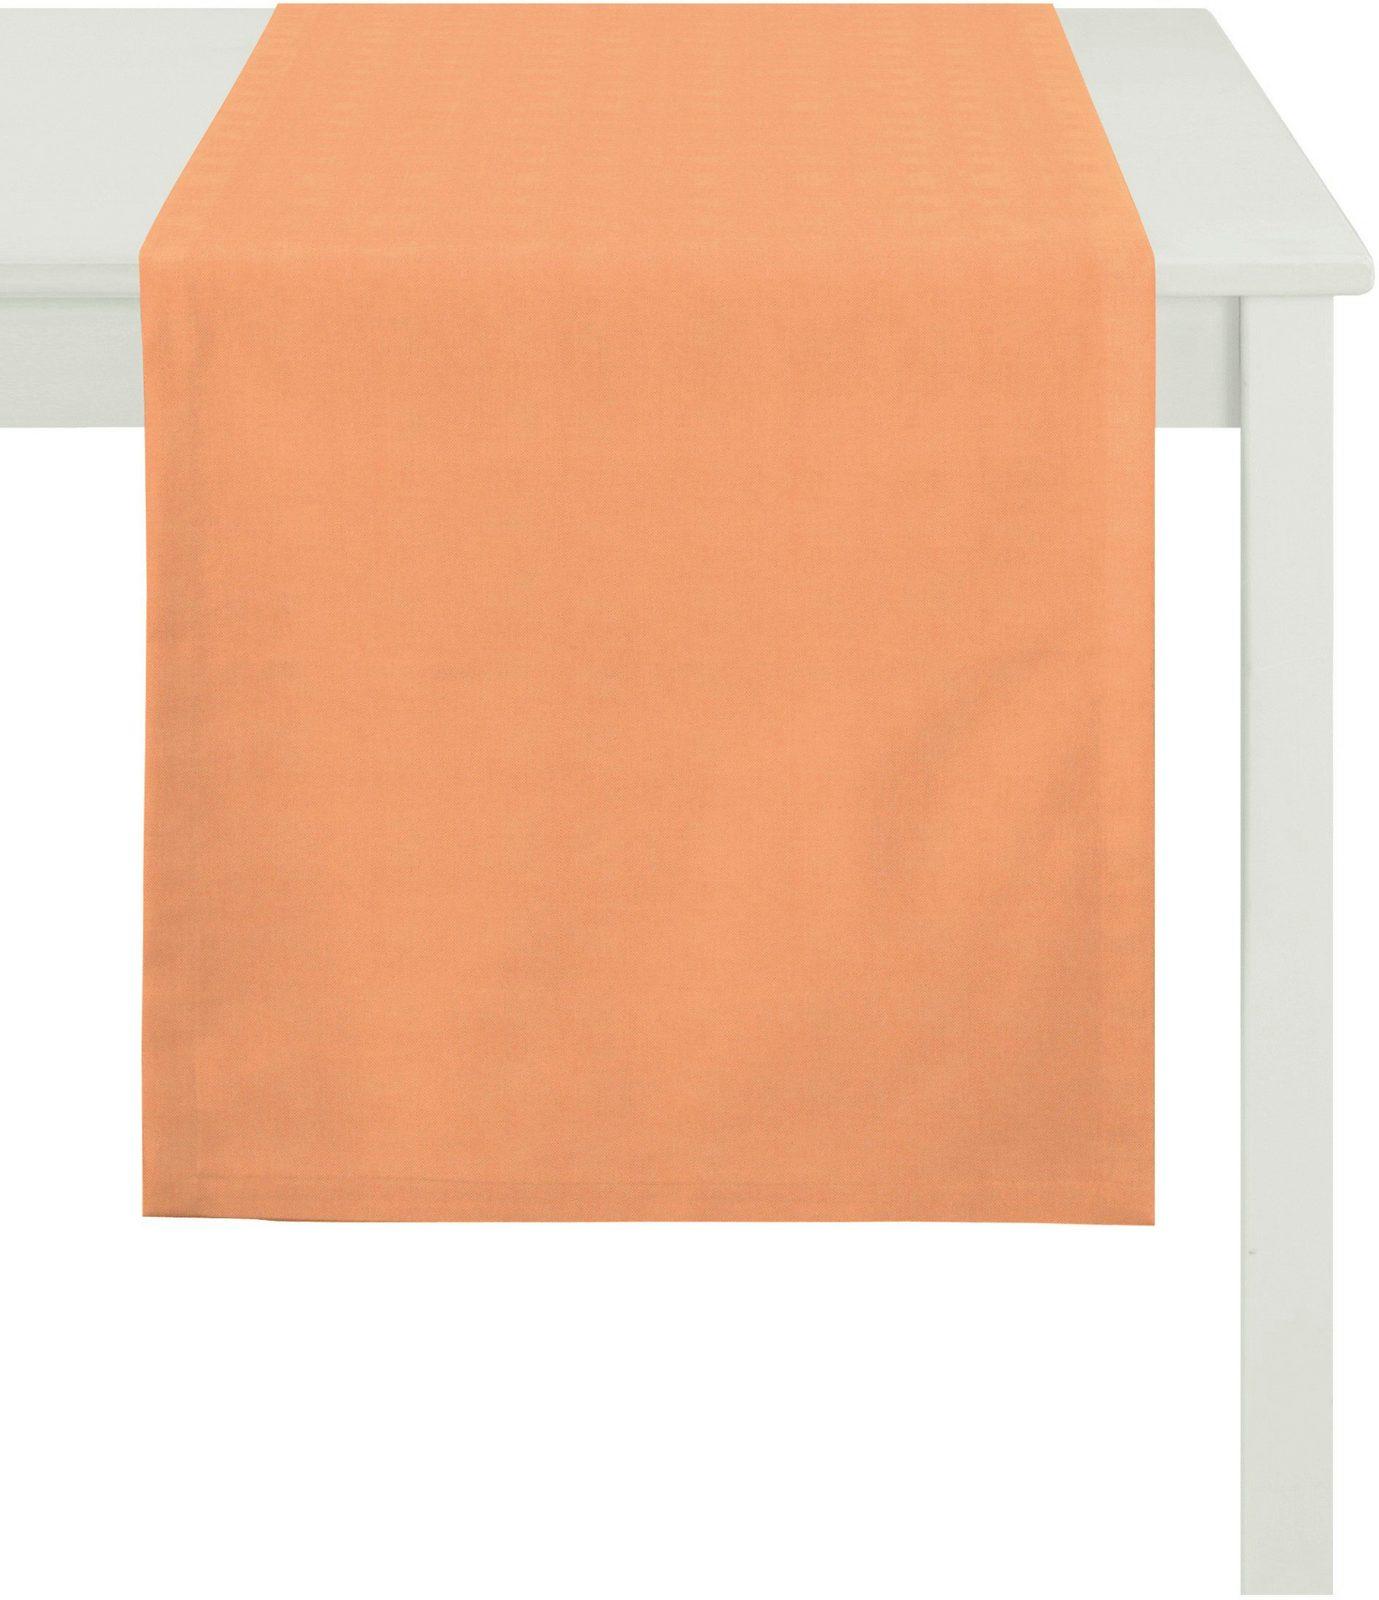 Apelt Tischläufer, »3944 UNI BASIC«